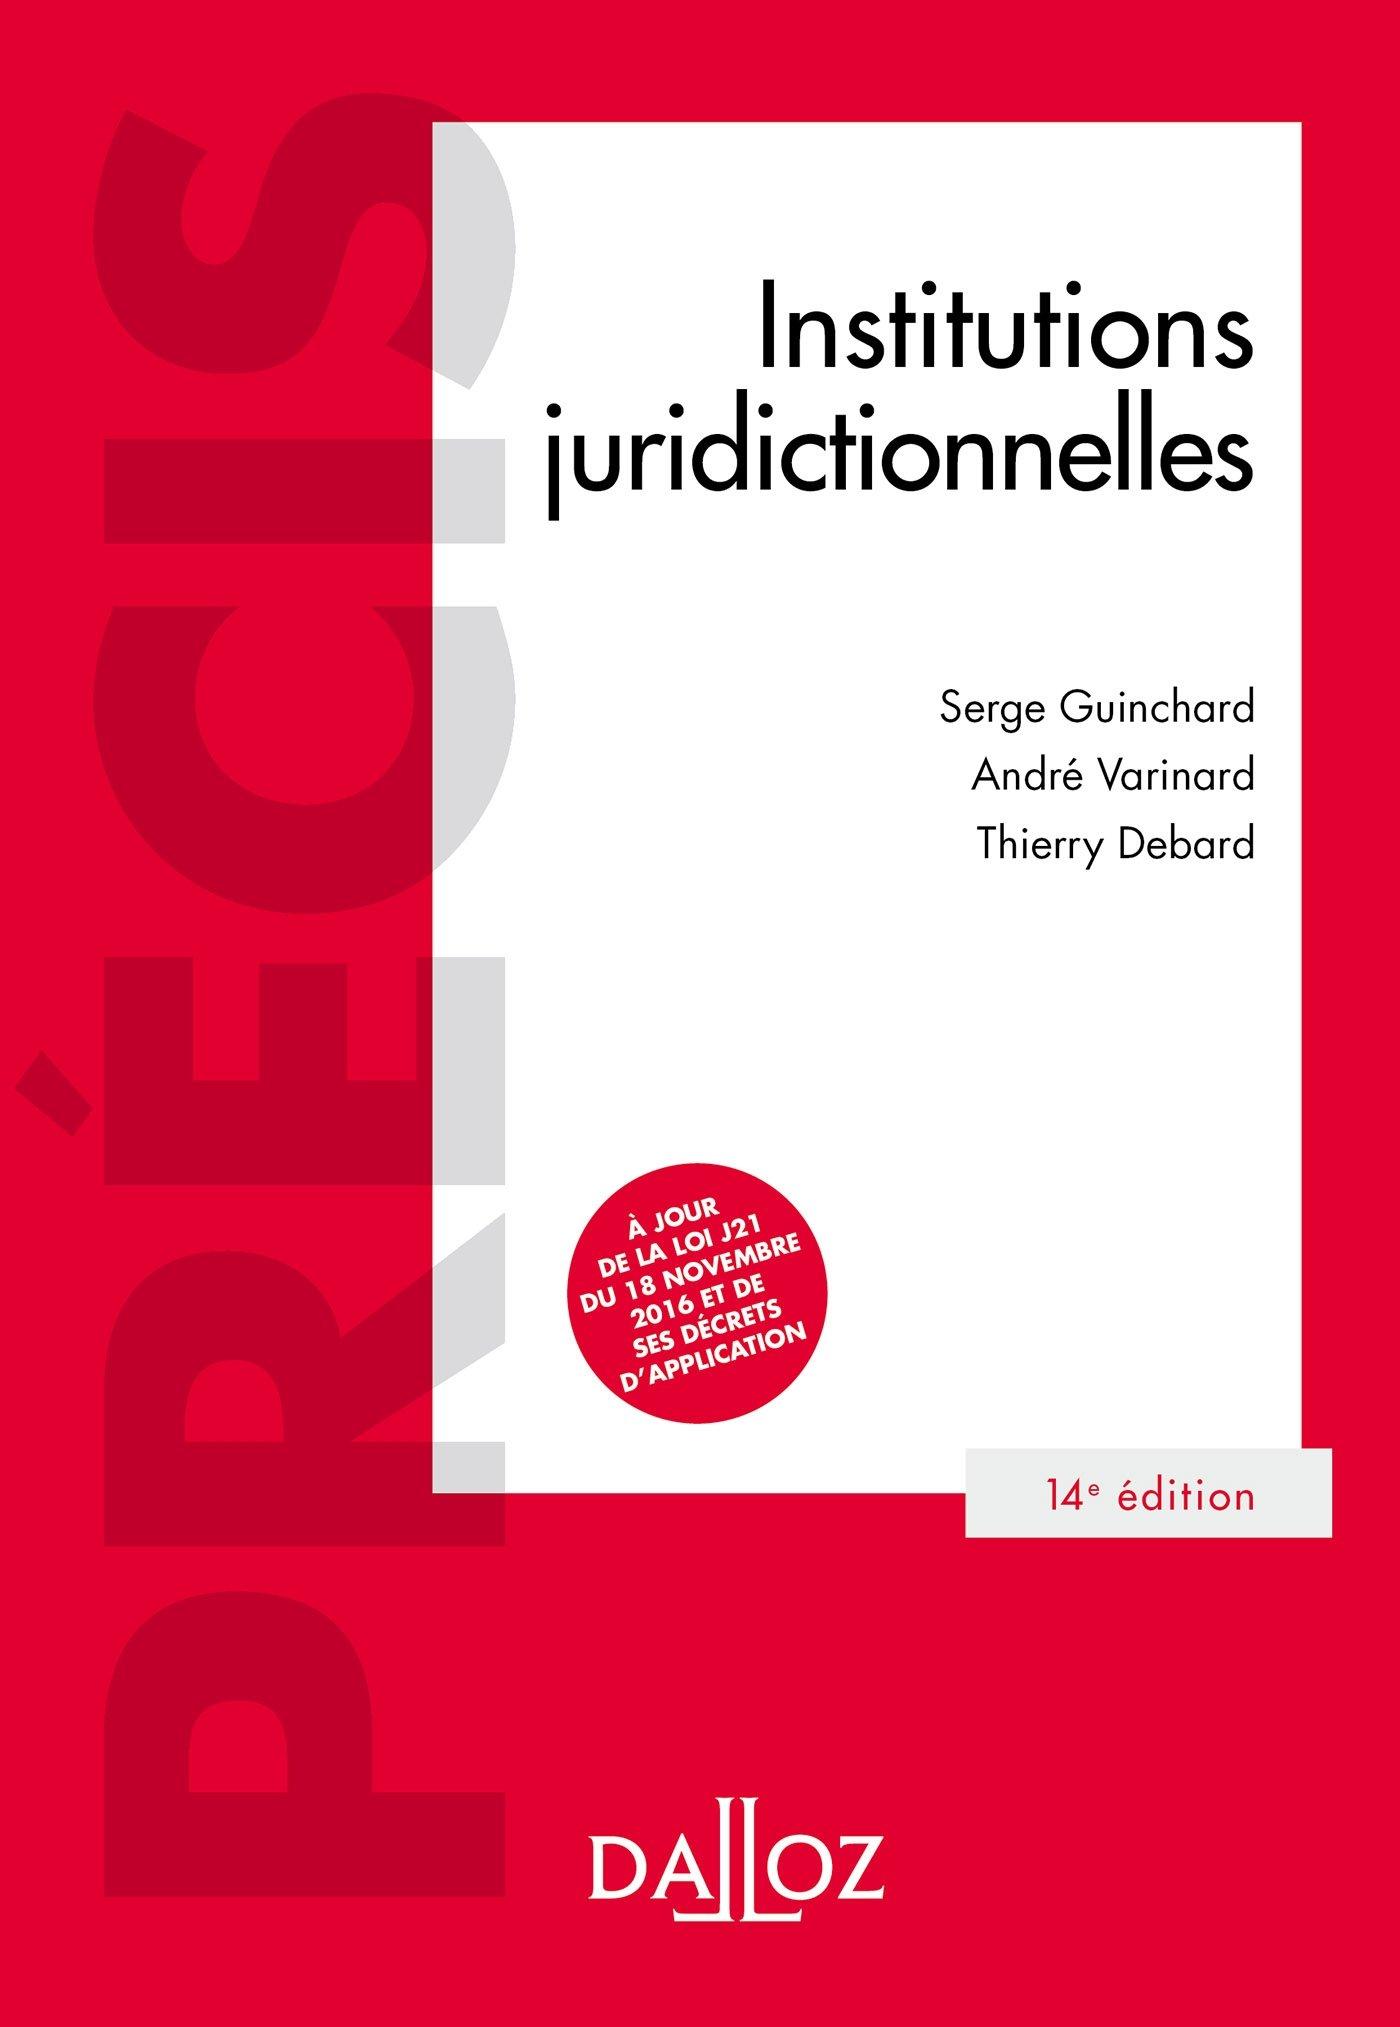 Pdf Telecharger Institutions Juridictionnelles 14e Ed Par Serge Guinchard Thierry Debard Epub Ebook Livrespdfcom Buyers Guide It